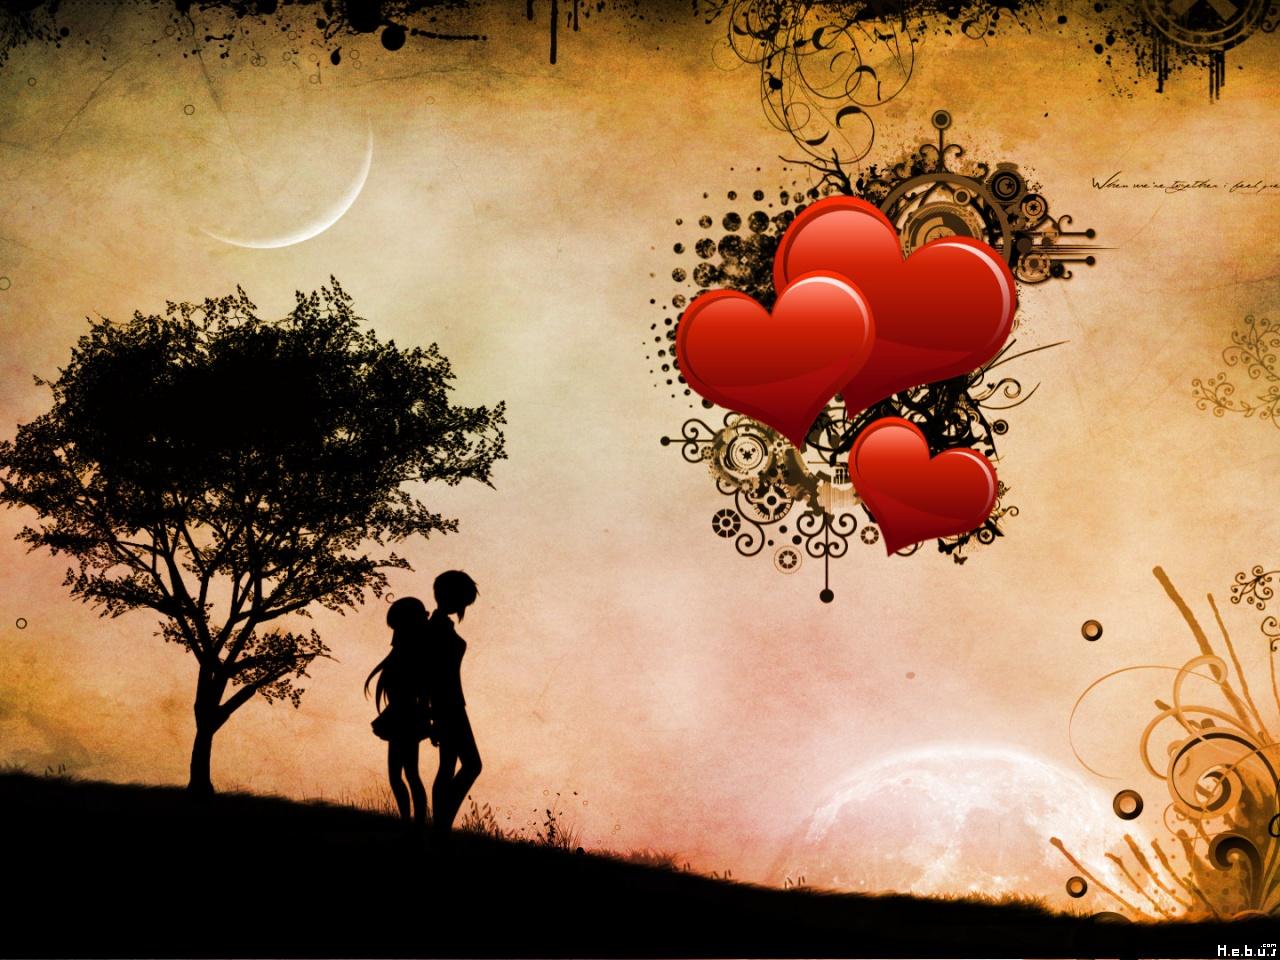 Love Desktop Wallpaper Full Hd: 3D Love Images Hd 20 Desktop Wallpaper